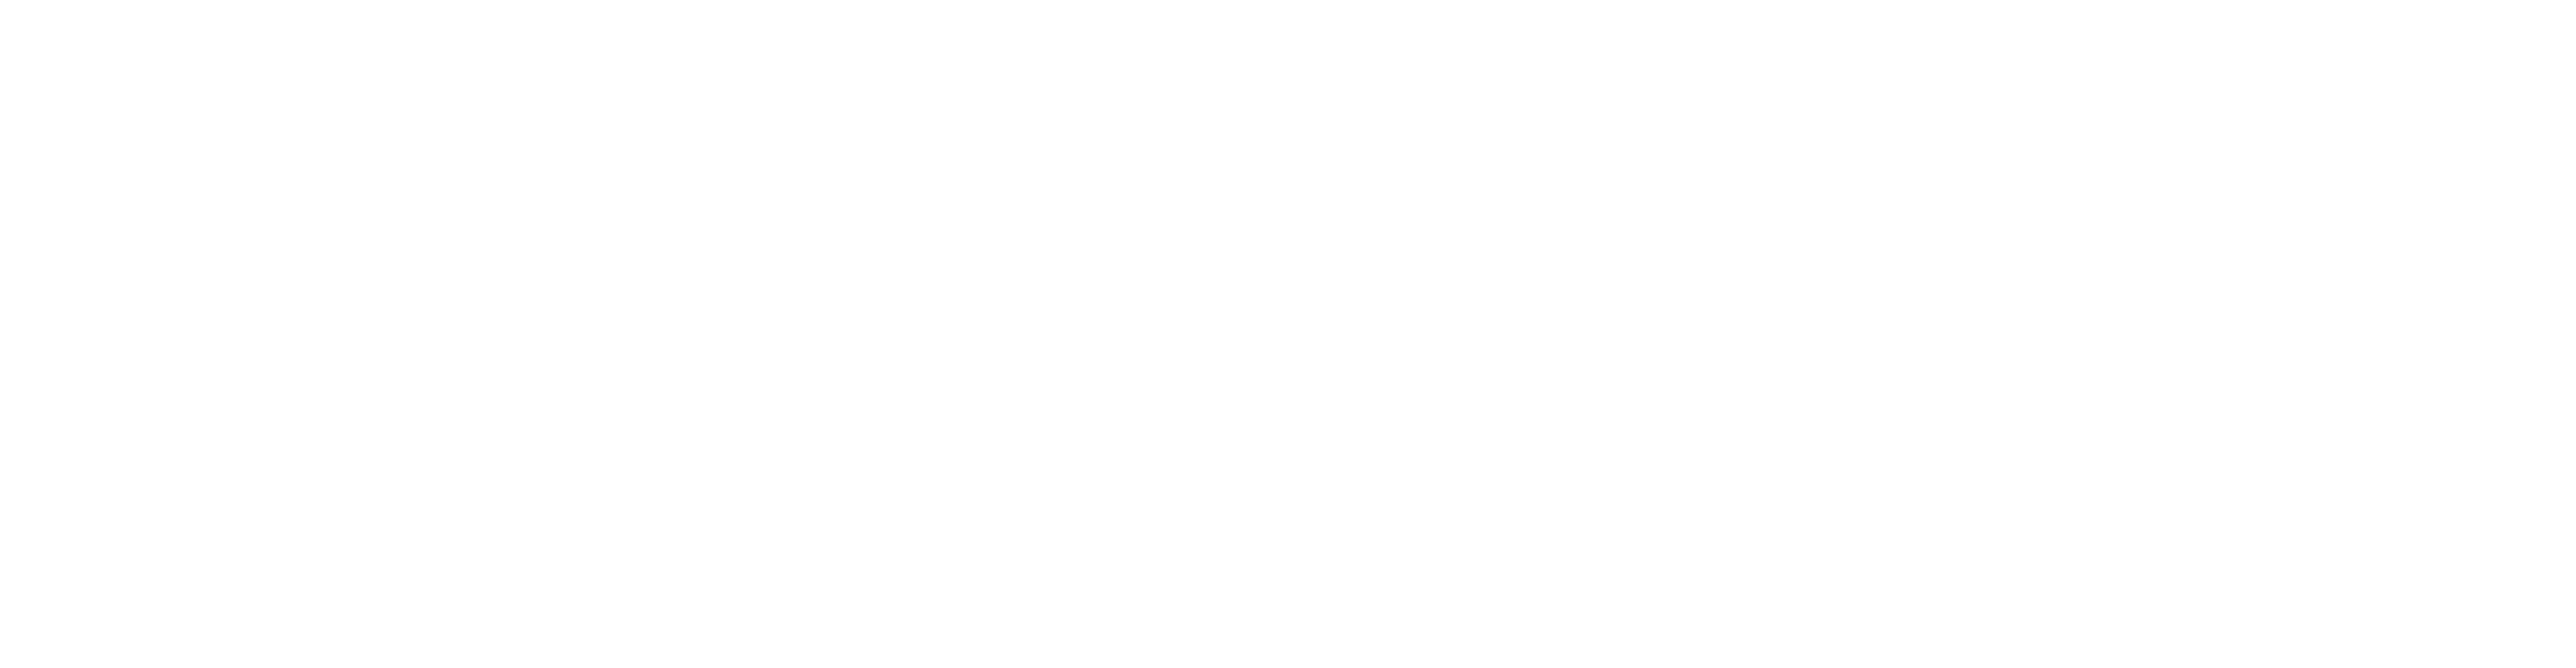 relayter_logo_title_white-01